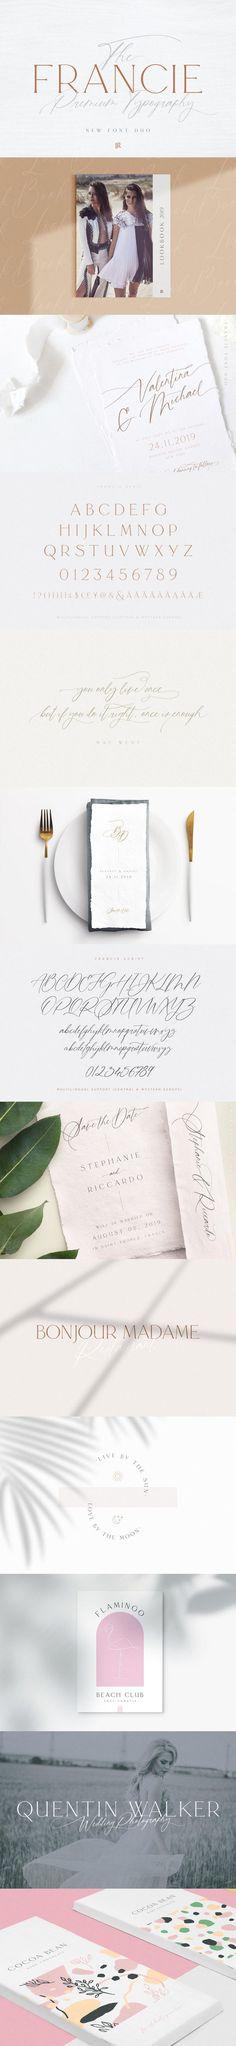 Francie Font Duo #otf #webopenfontformat #beauty #LogoType #blog #ttf #opentype #woff #otf #opentypefont #invitation #alphabet #serif #masthead #handwritten #logo #elegant #black #LoveFont Calligraphy Fonts, Typography Fonts, Lettering, Typography Design, Feminine Fonts, Elegant Fonts, Wordmark, Truetype Fonts, Modern Font